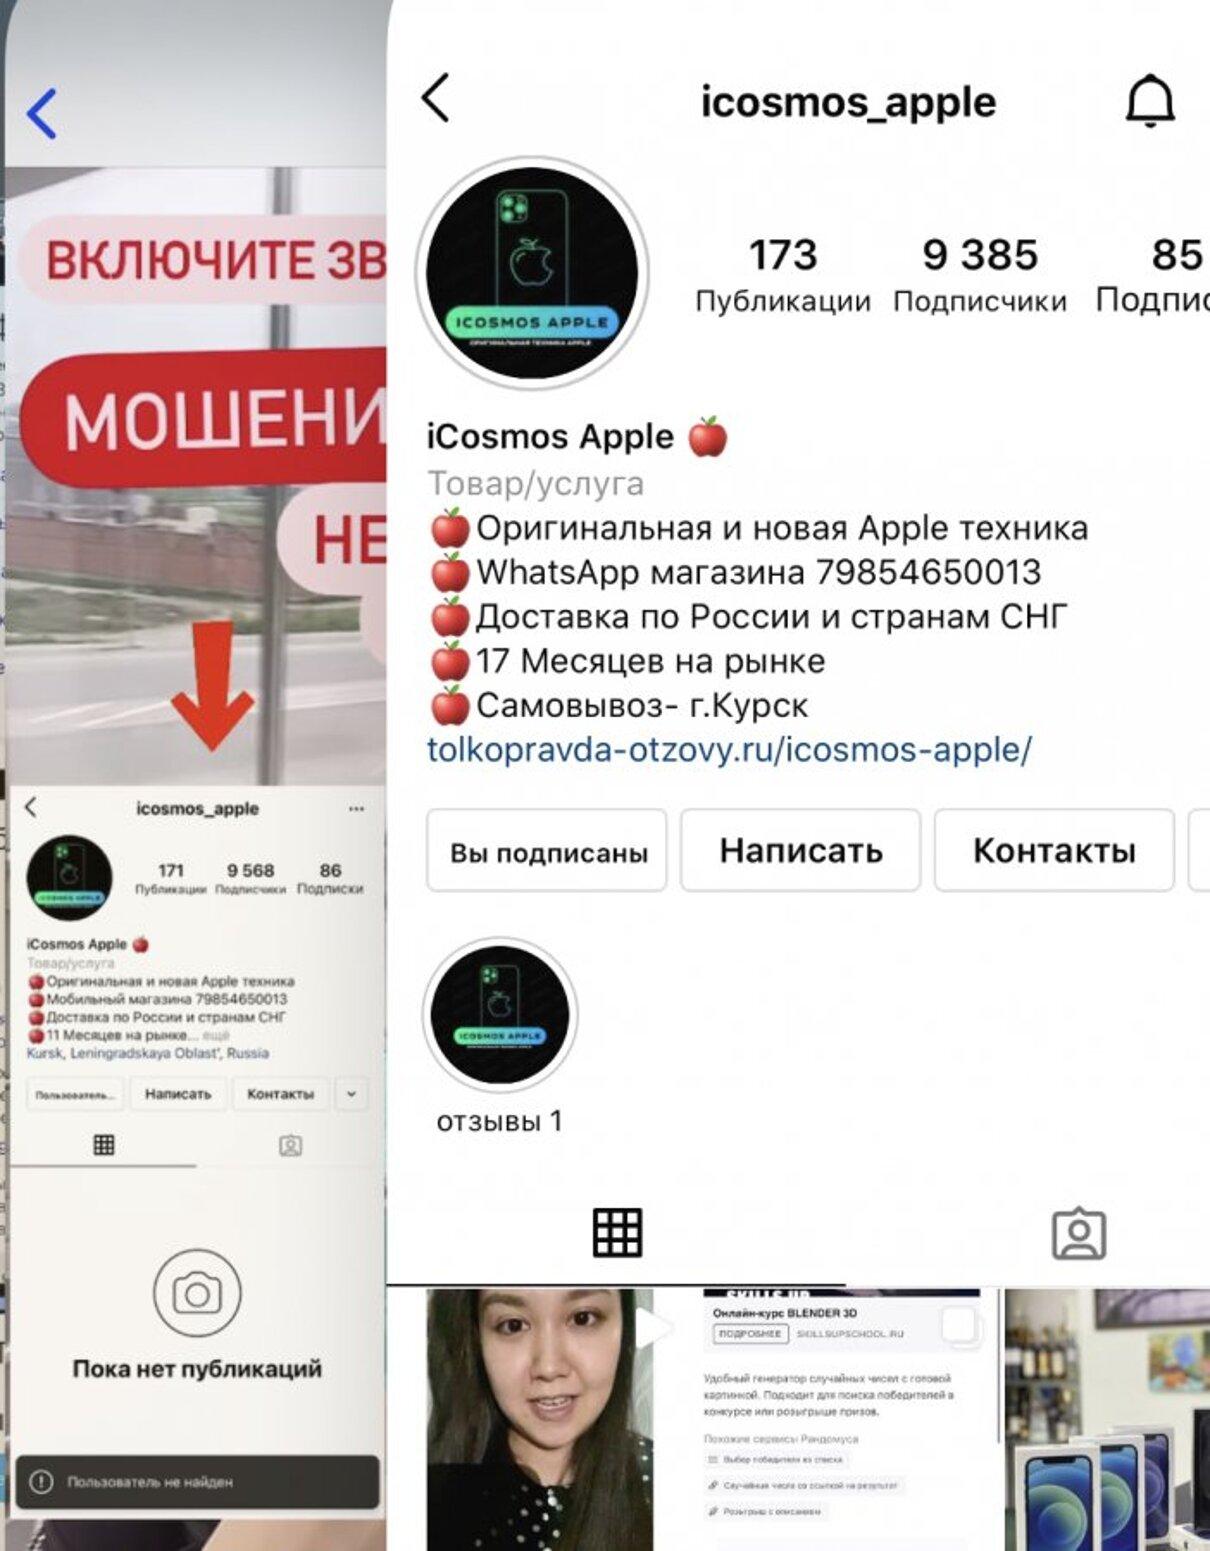 Жалоба-отзыв: Icosmos_apple ( в Инстаграмм ) - Https://instagram.com/icosmos_apple? igshid=1oc7px87b03ue.  Фото №2